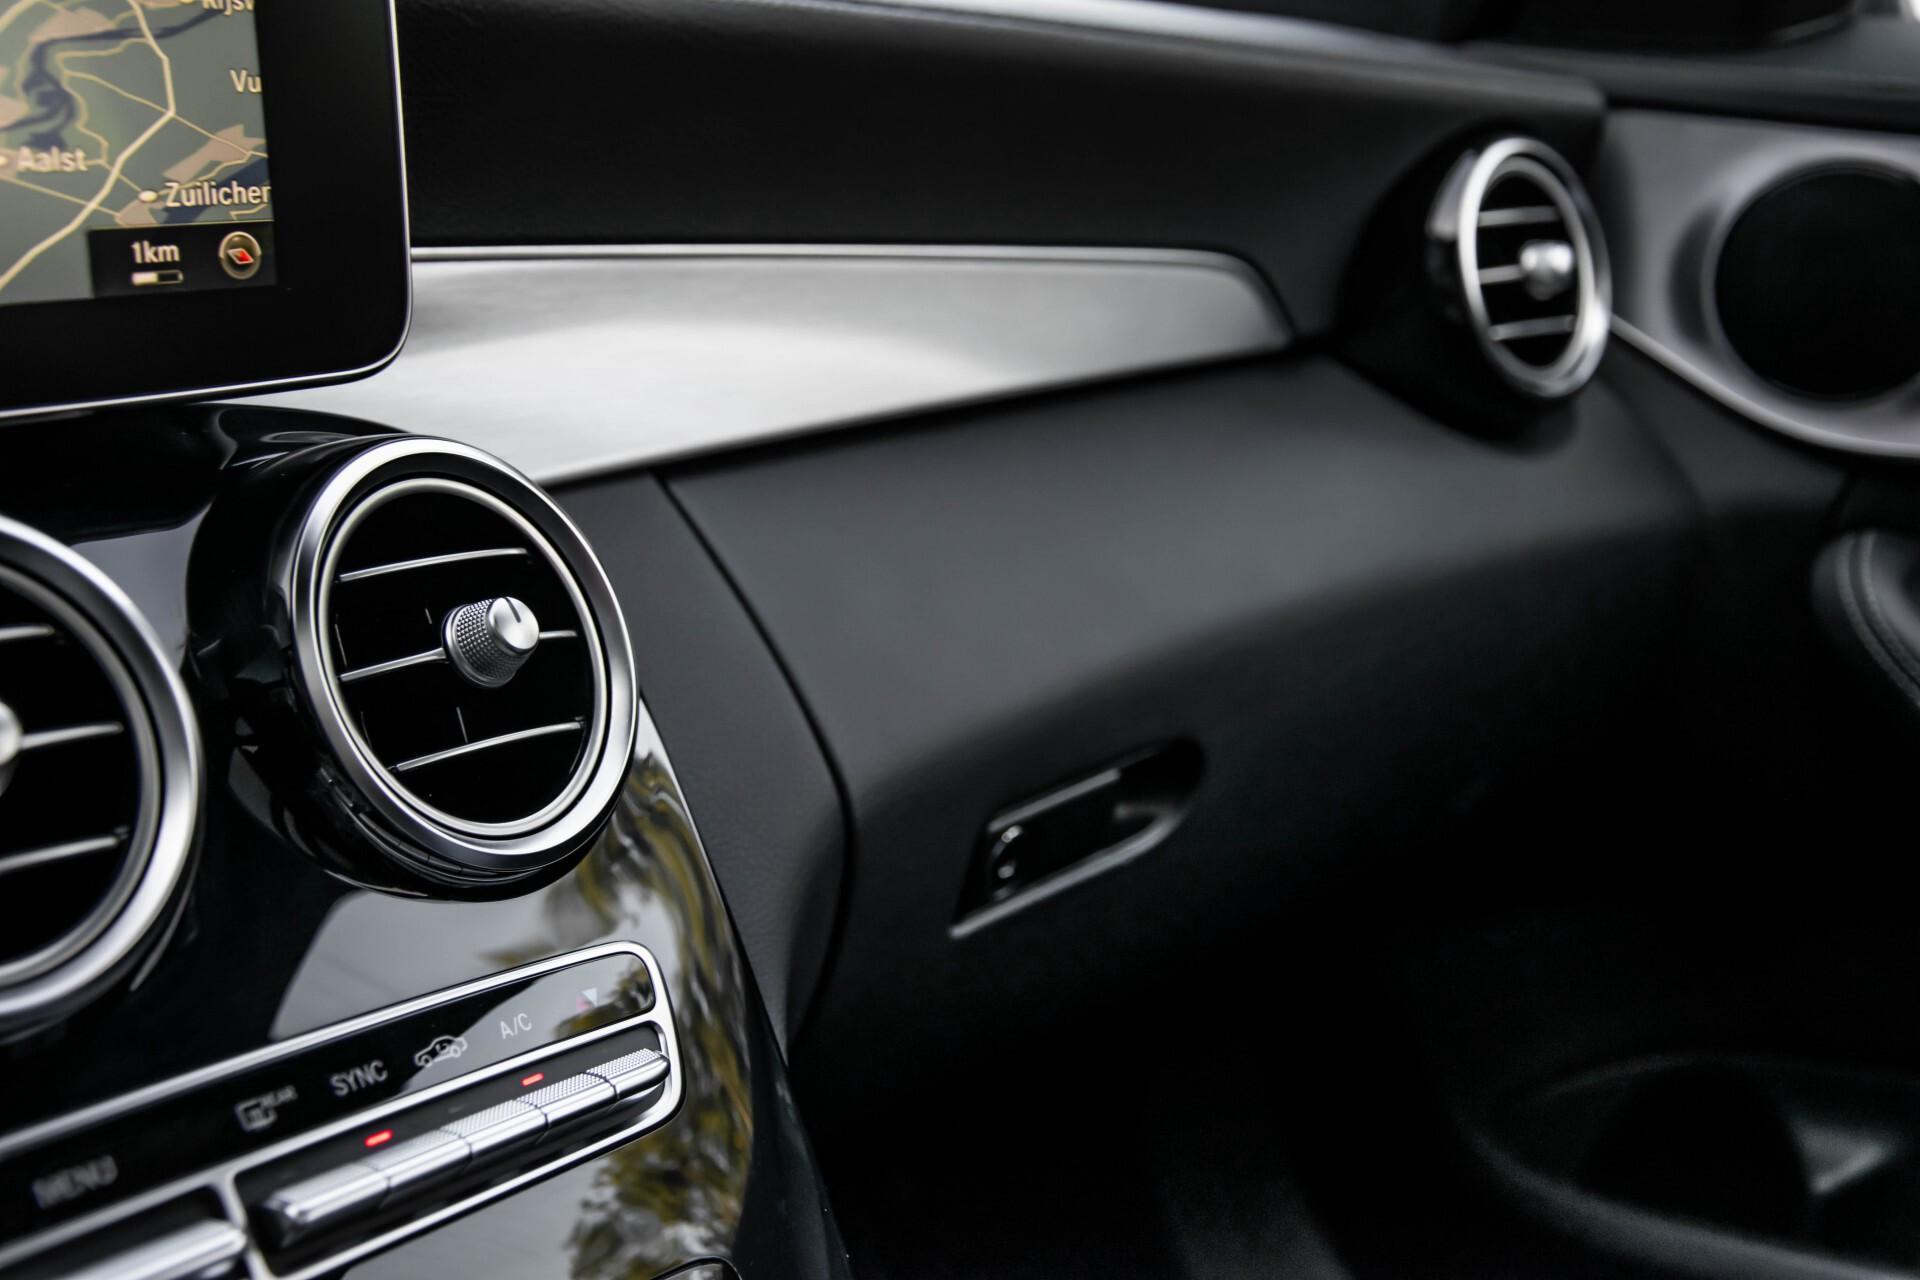 Mercedes-Benz C-Klasse 63 AMG S Panorama/Distronic/Keyless/Comand/Camera/ILS Aut7 Foto 42